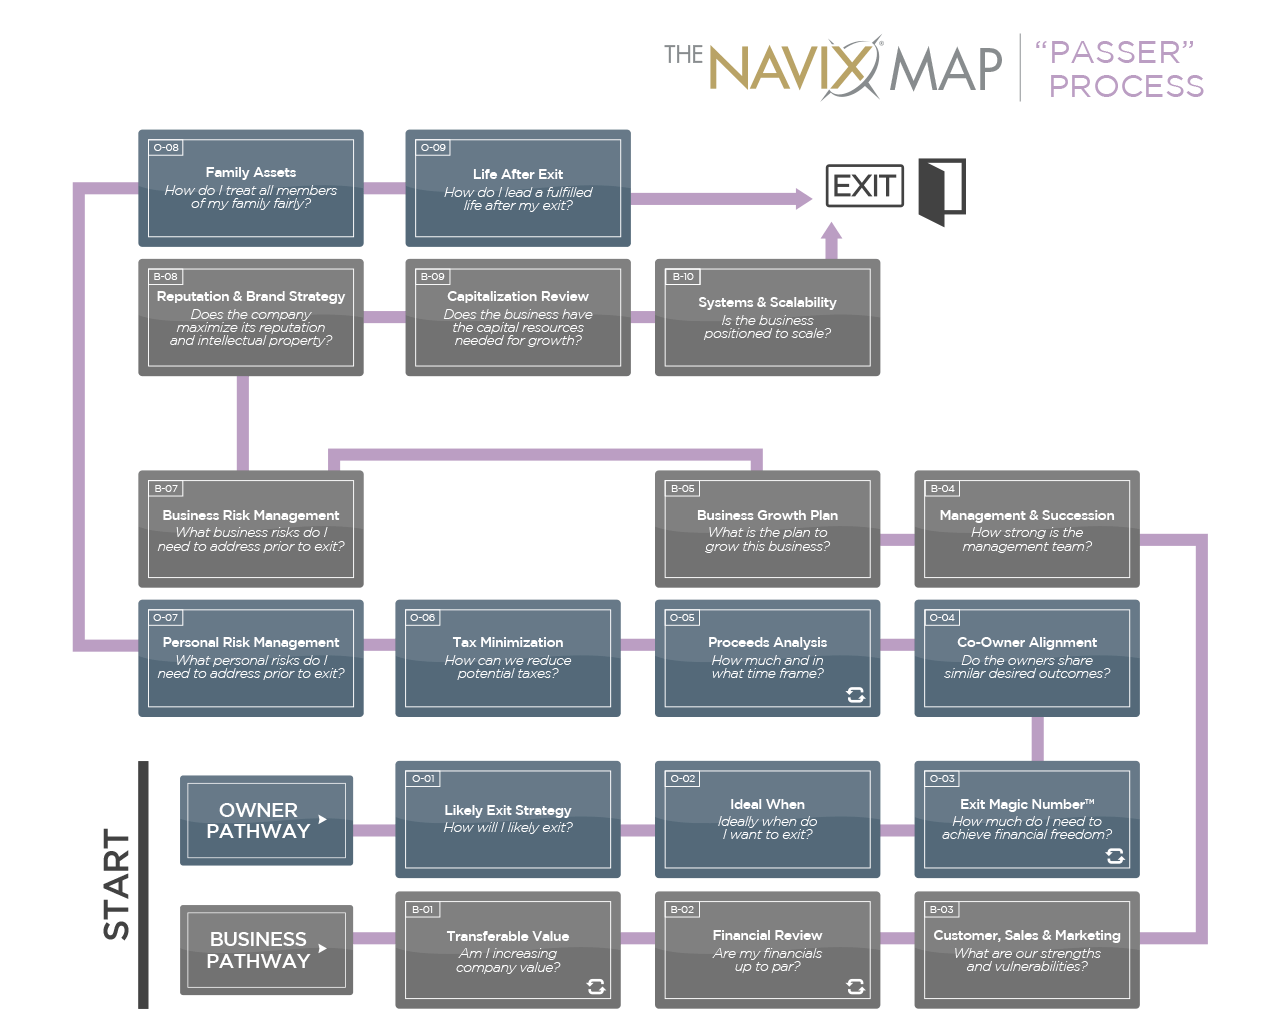 The NAVIX Map   The Passer Process